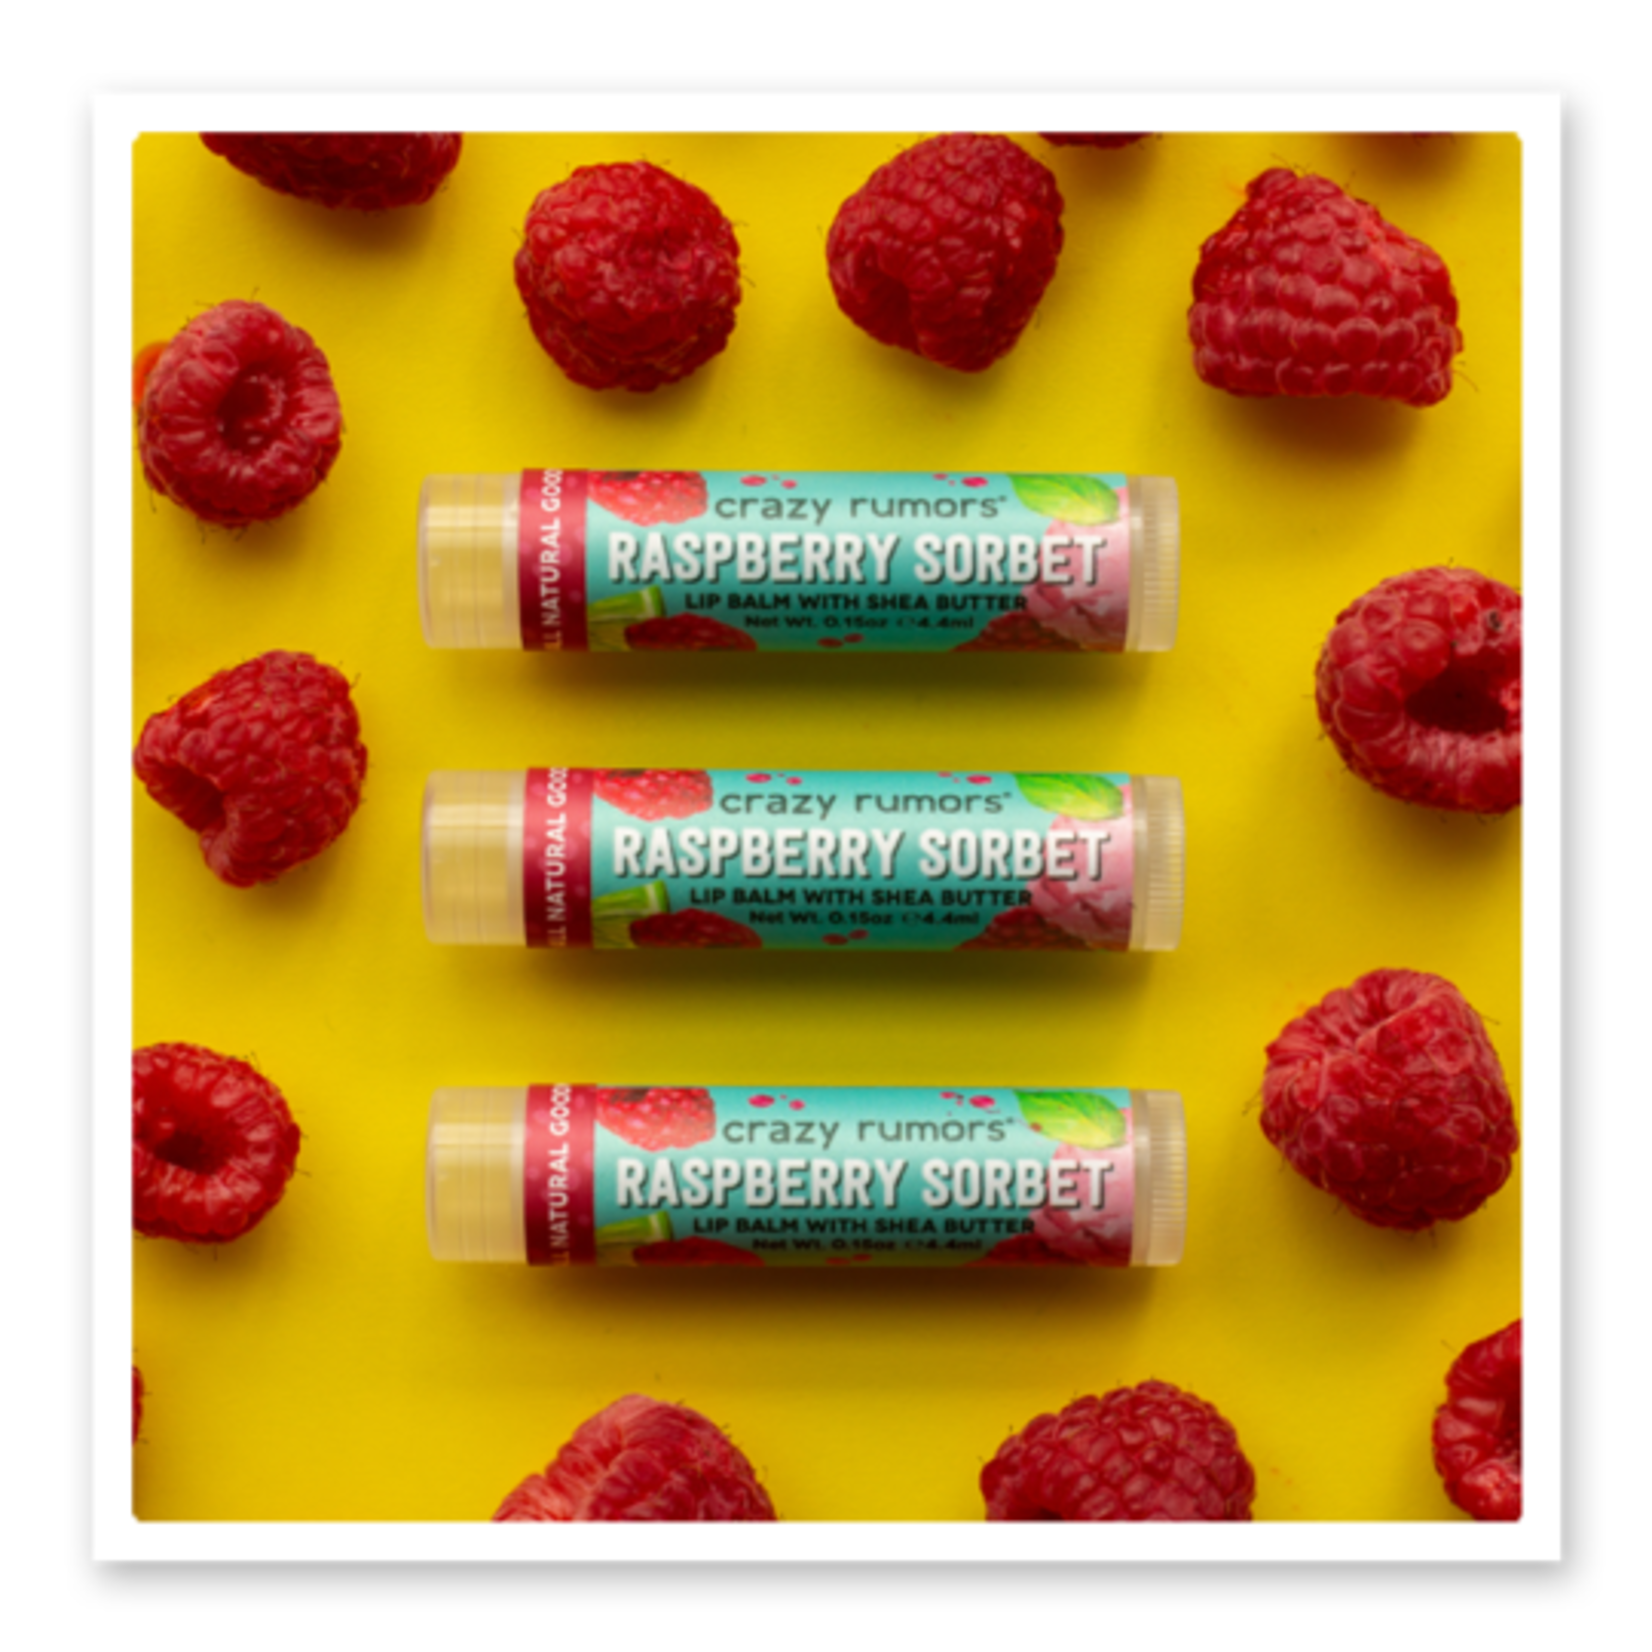 Crazy Rumors Raspberry Sorbet Lip Balm